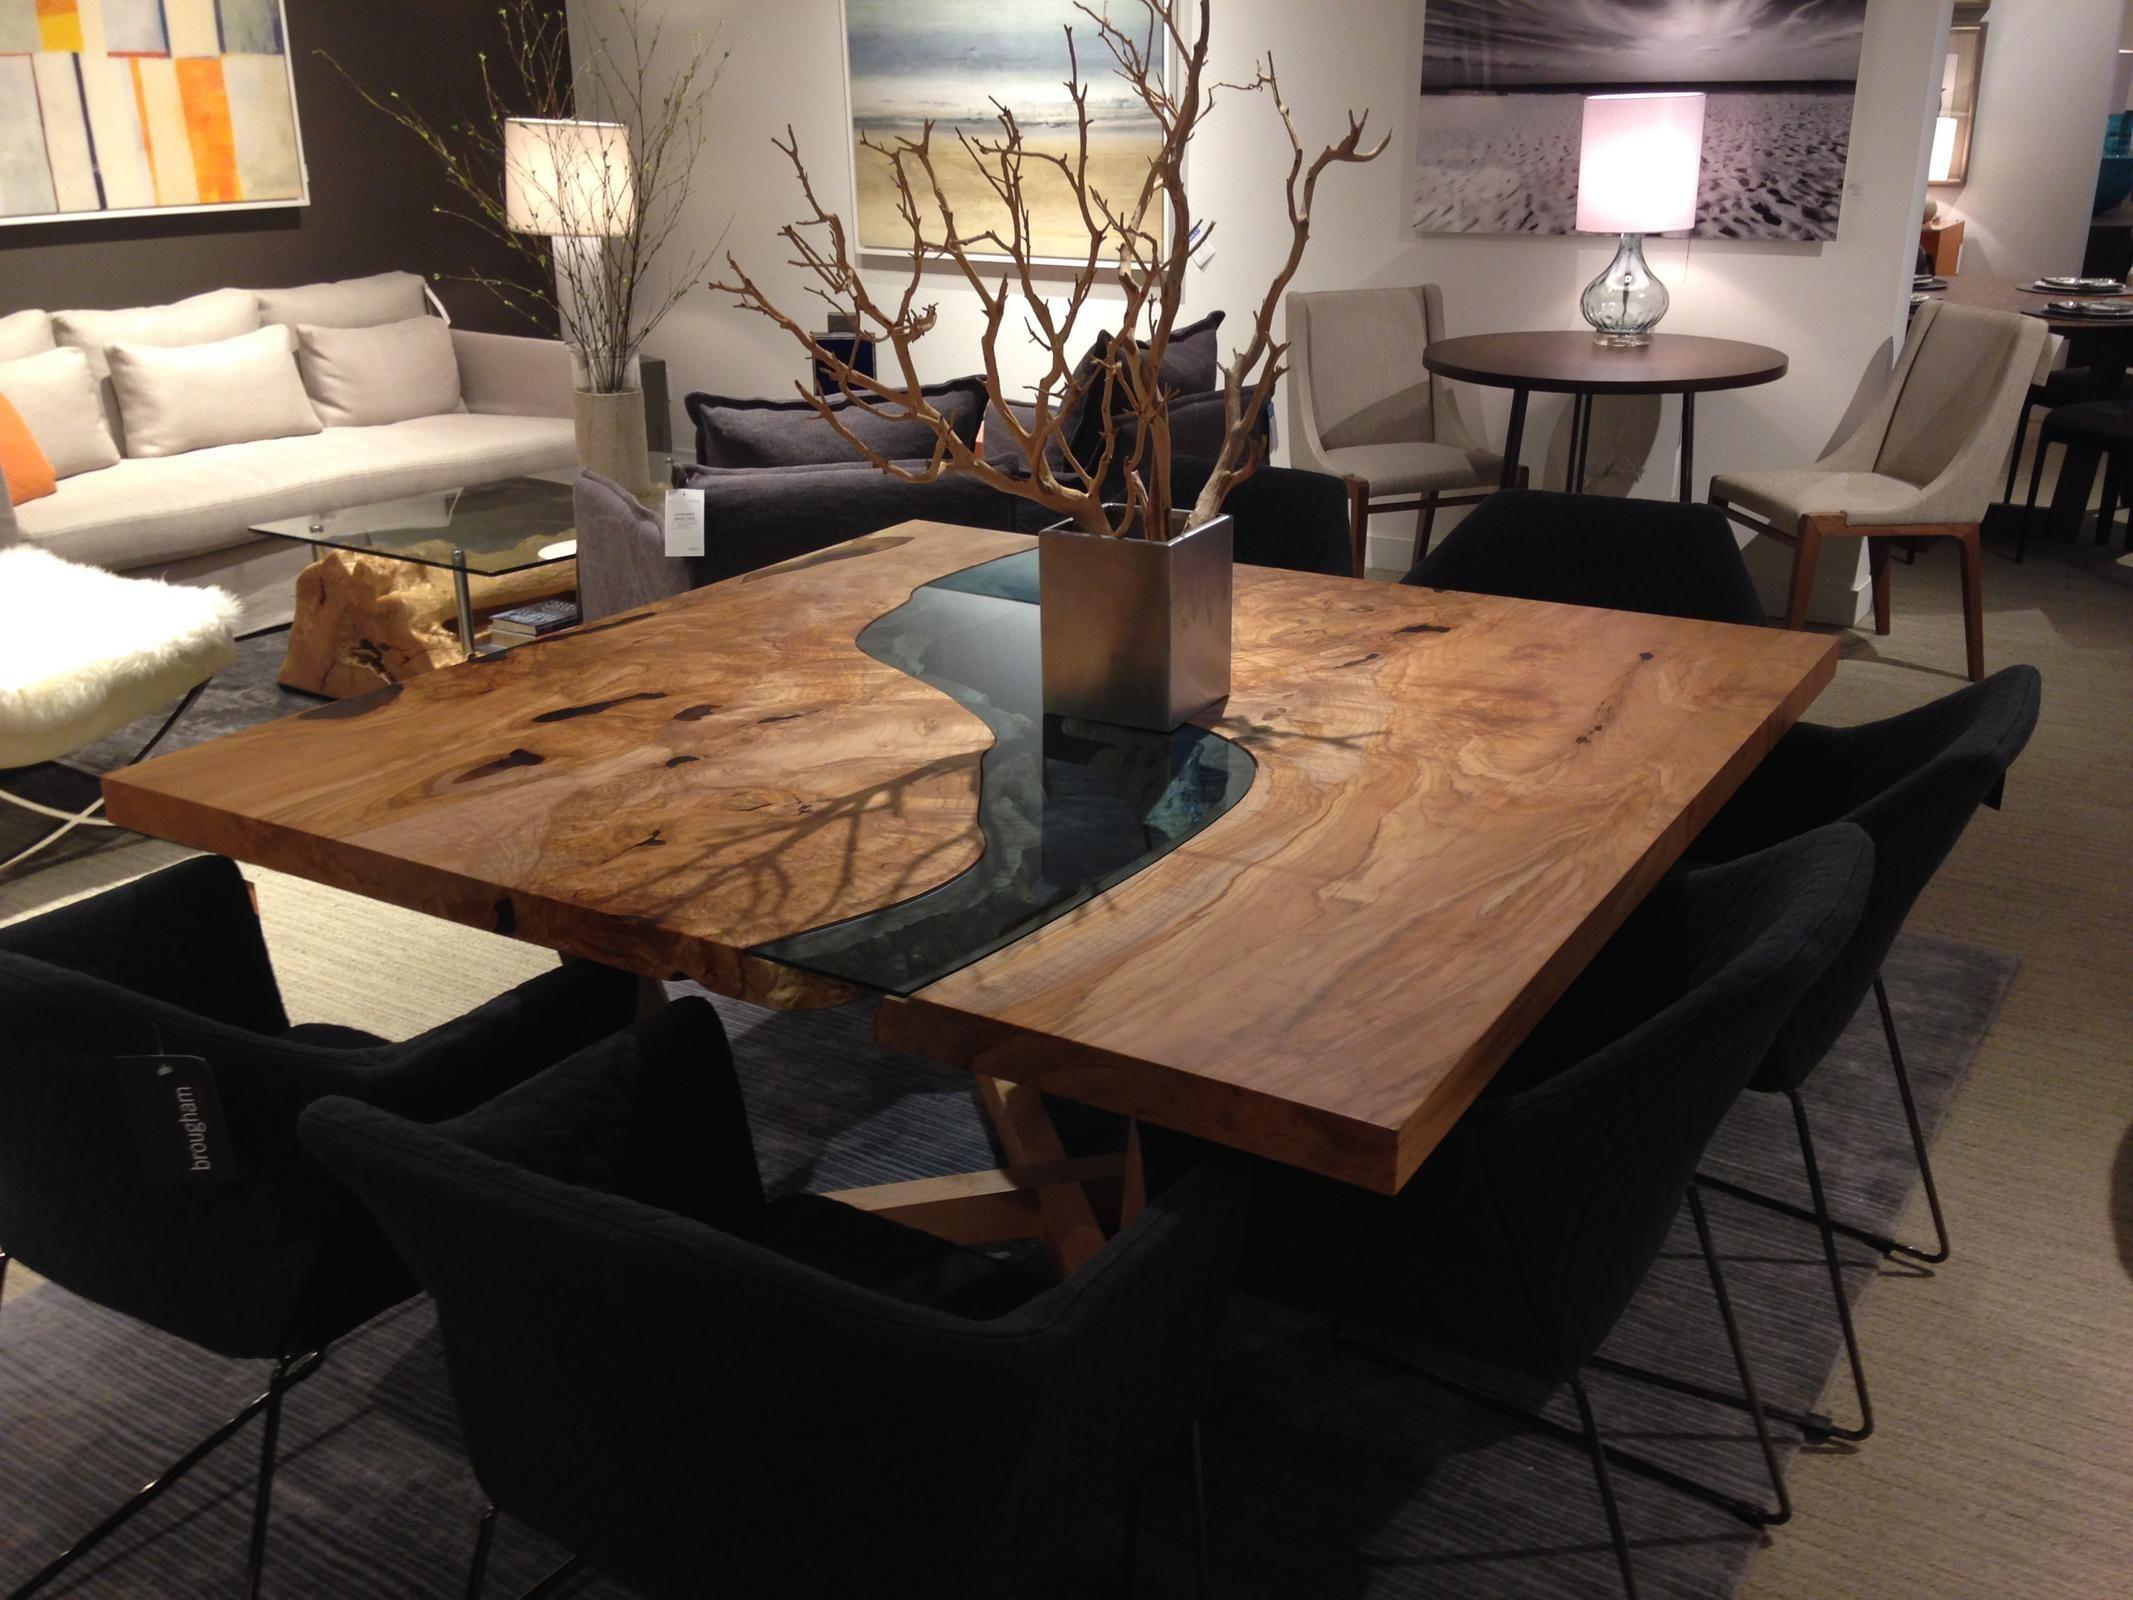 Leviathan Dining Table Dining Table Design Farmhouse Table